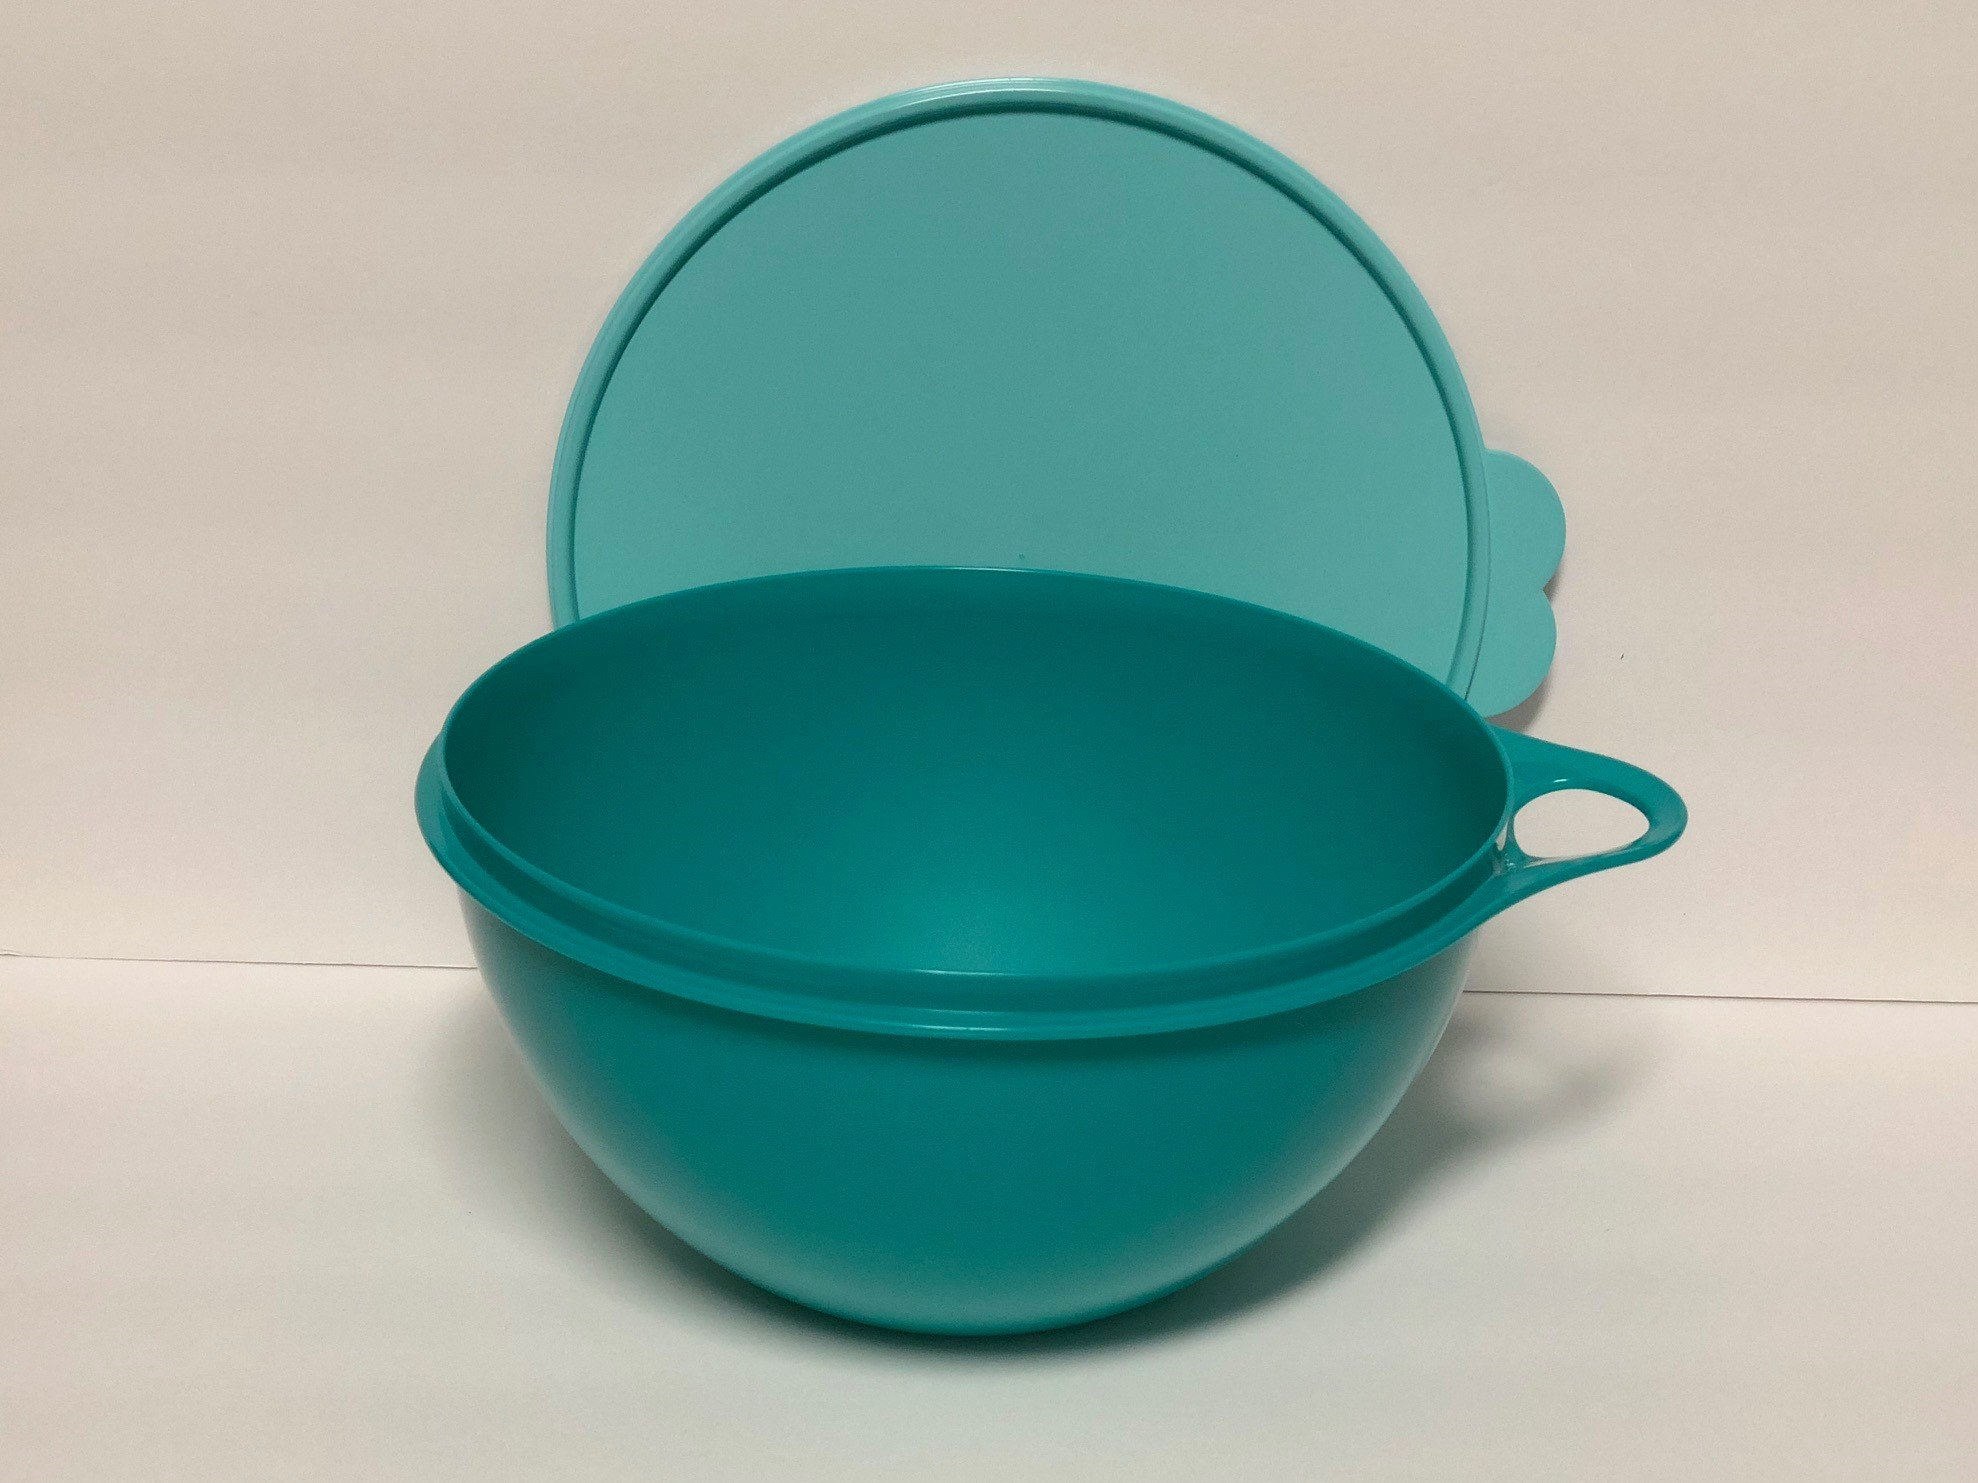 Tupperware 19 Cup Thatsa Medium Bowl in Teal